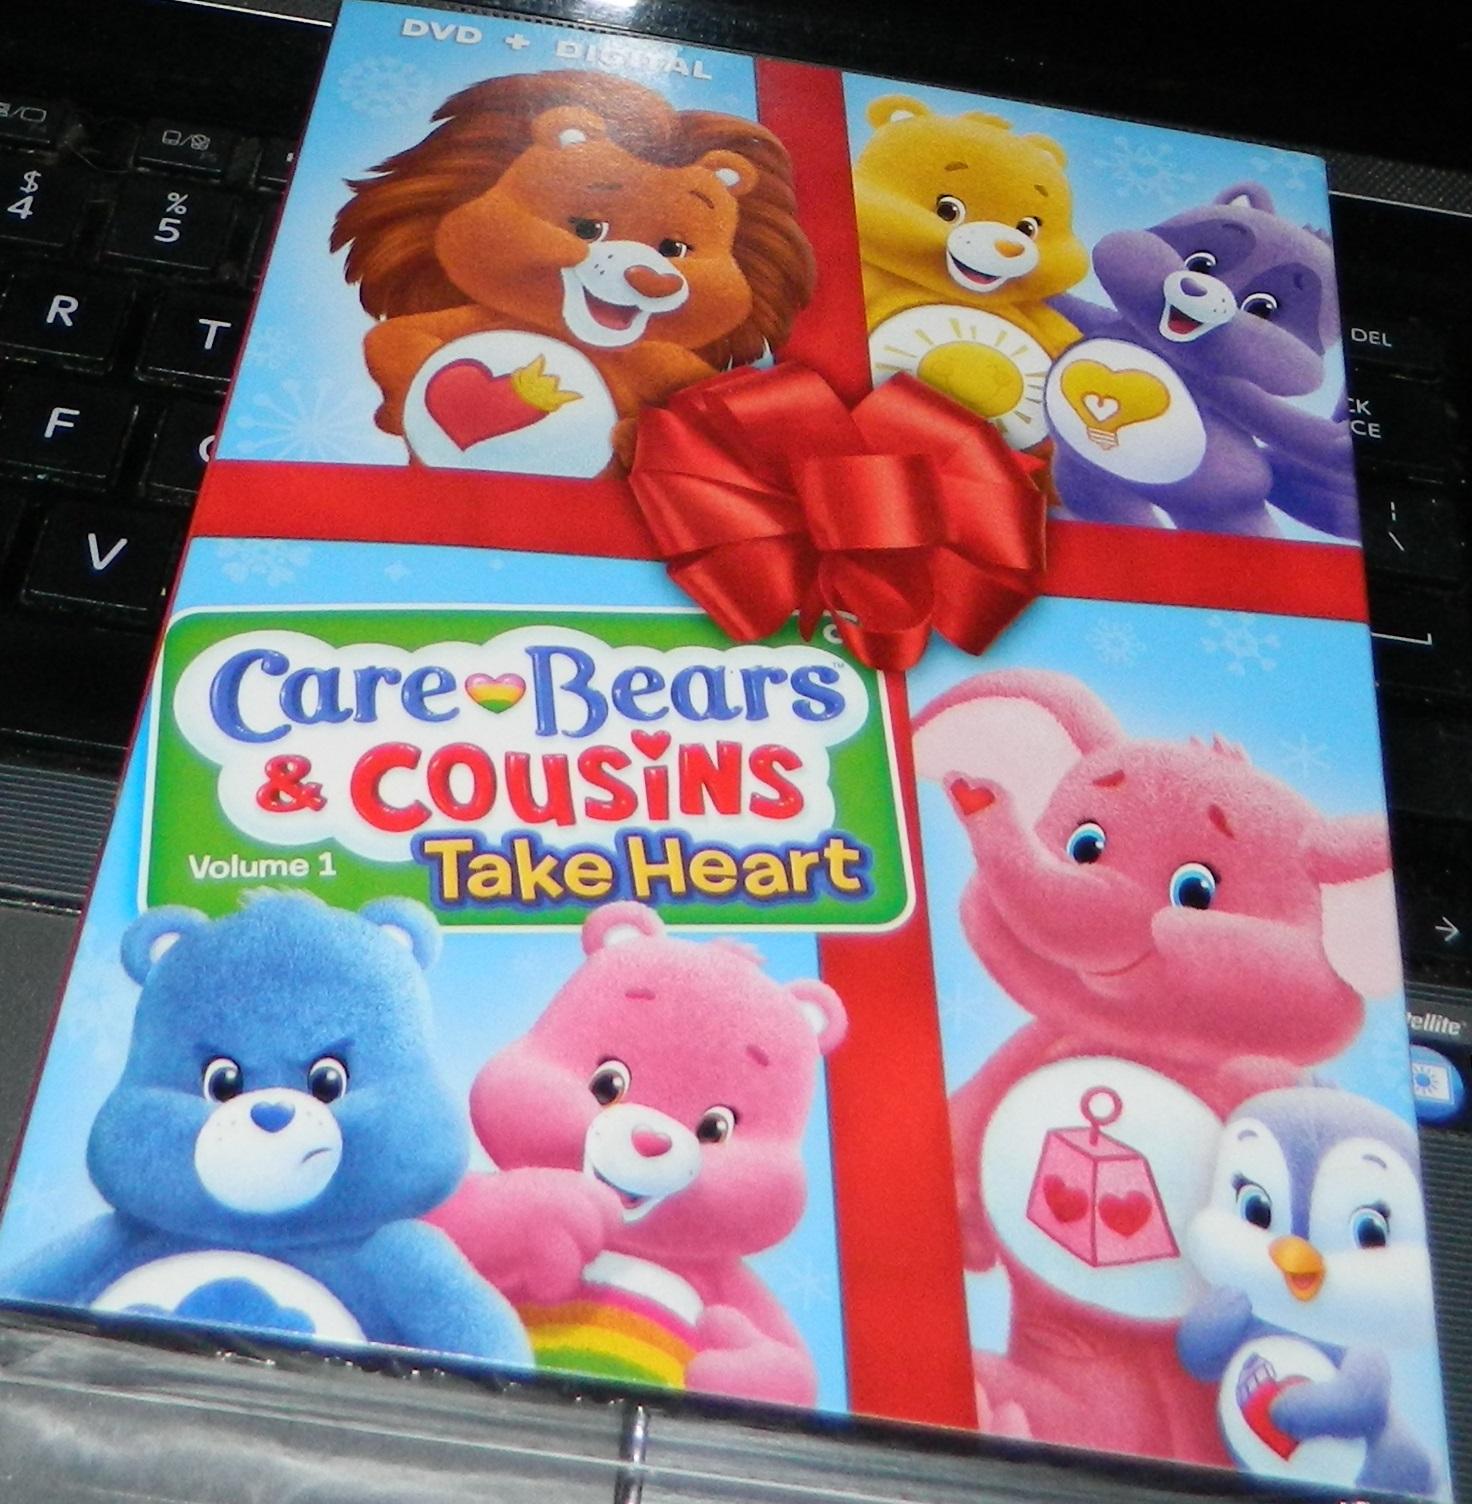 Take Heart [DVD + Digital]